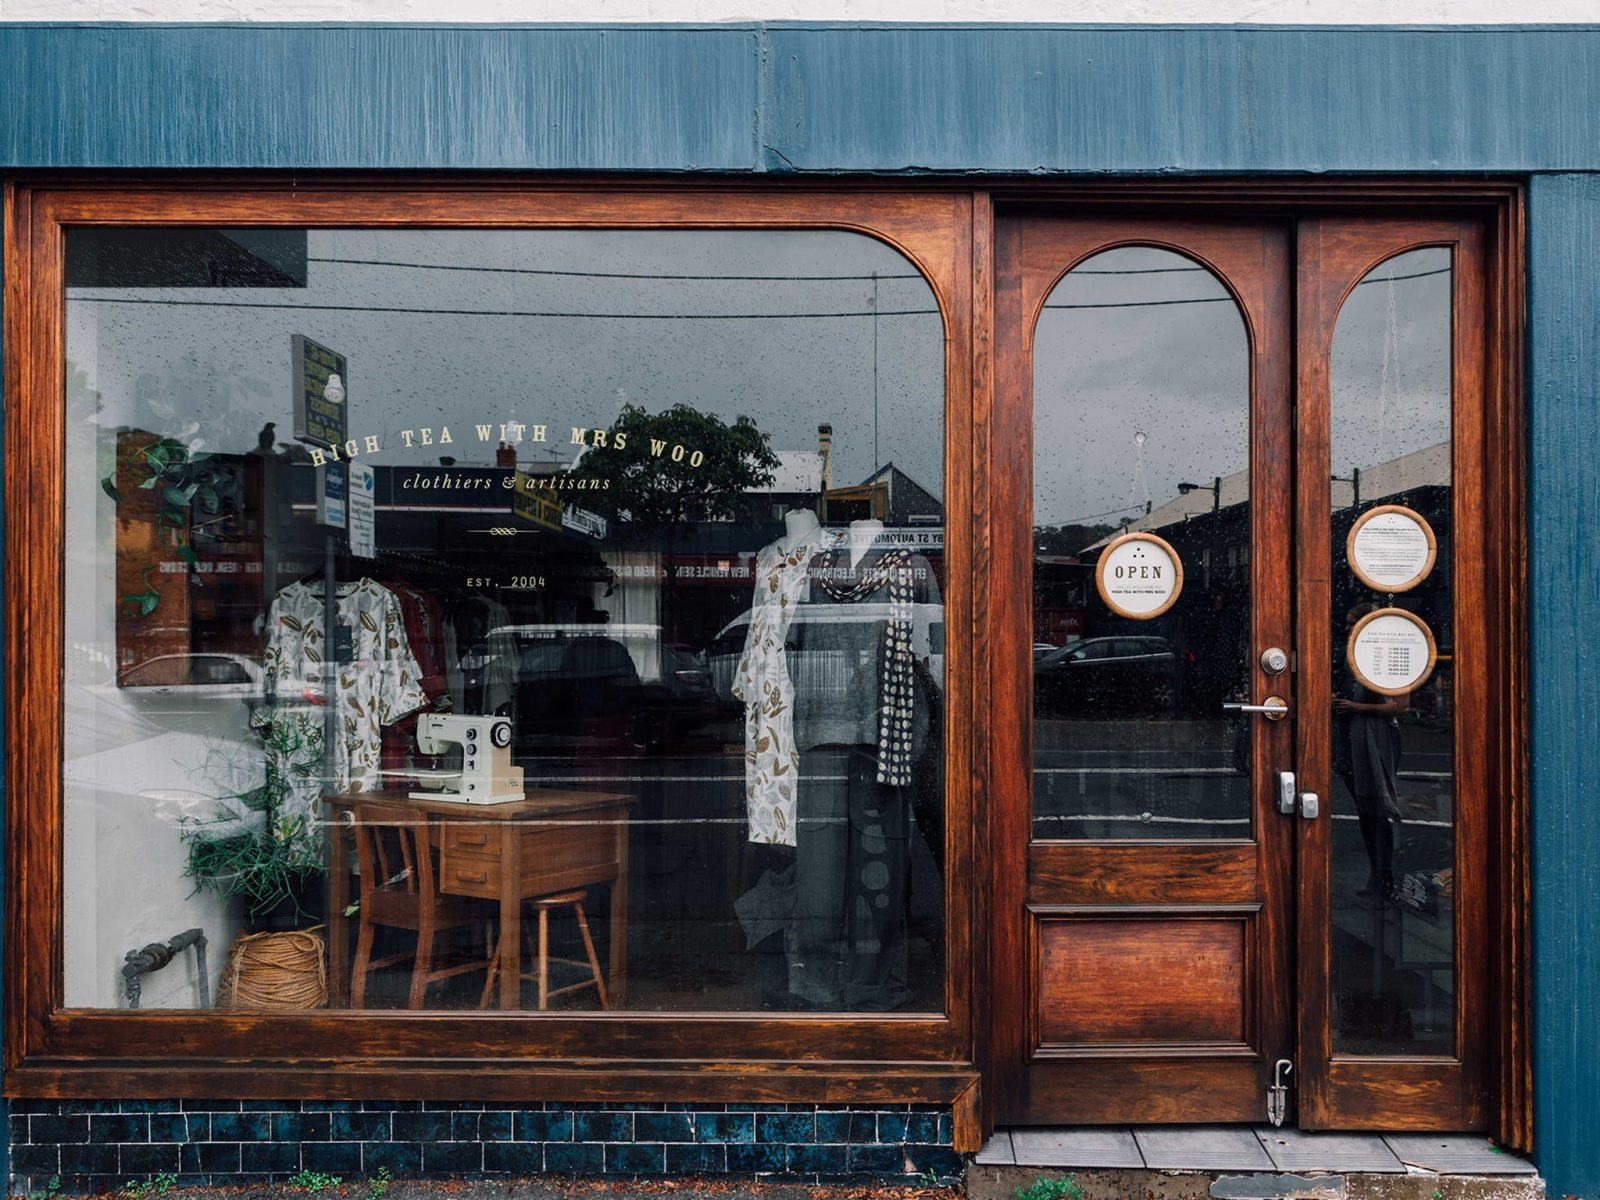 High Tea with Mrs Woo - shopfront window